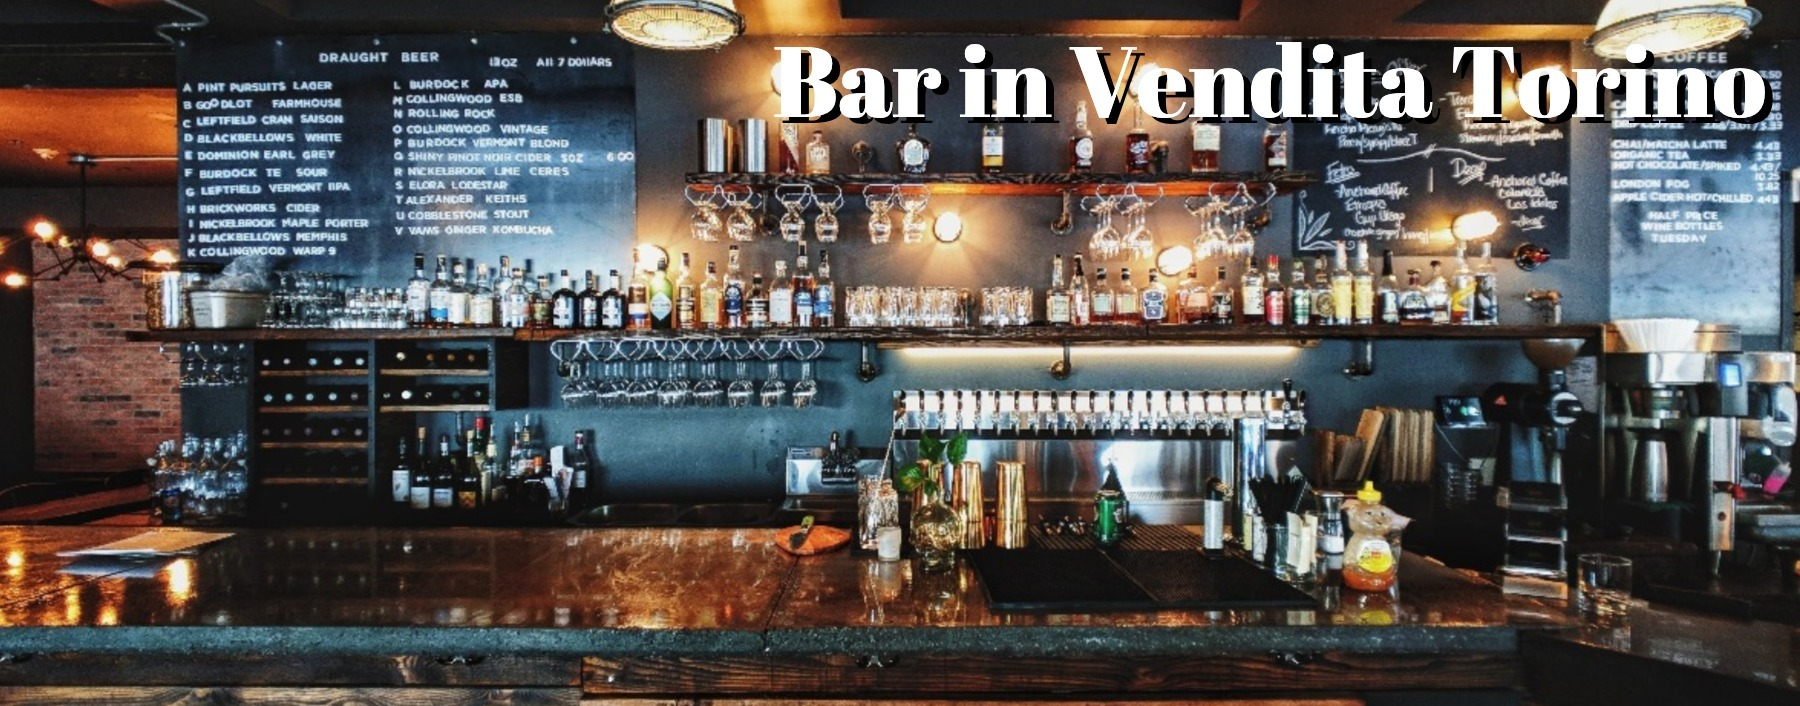 Bar in Vendita Torino